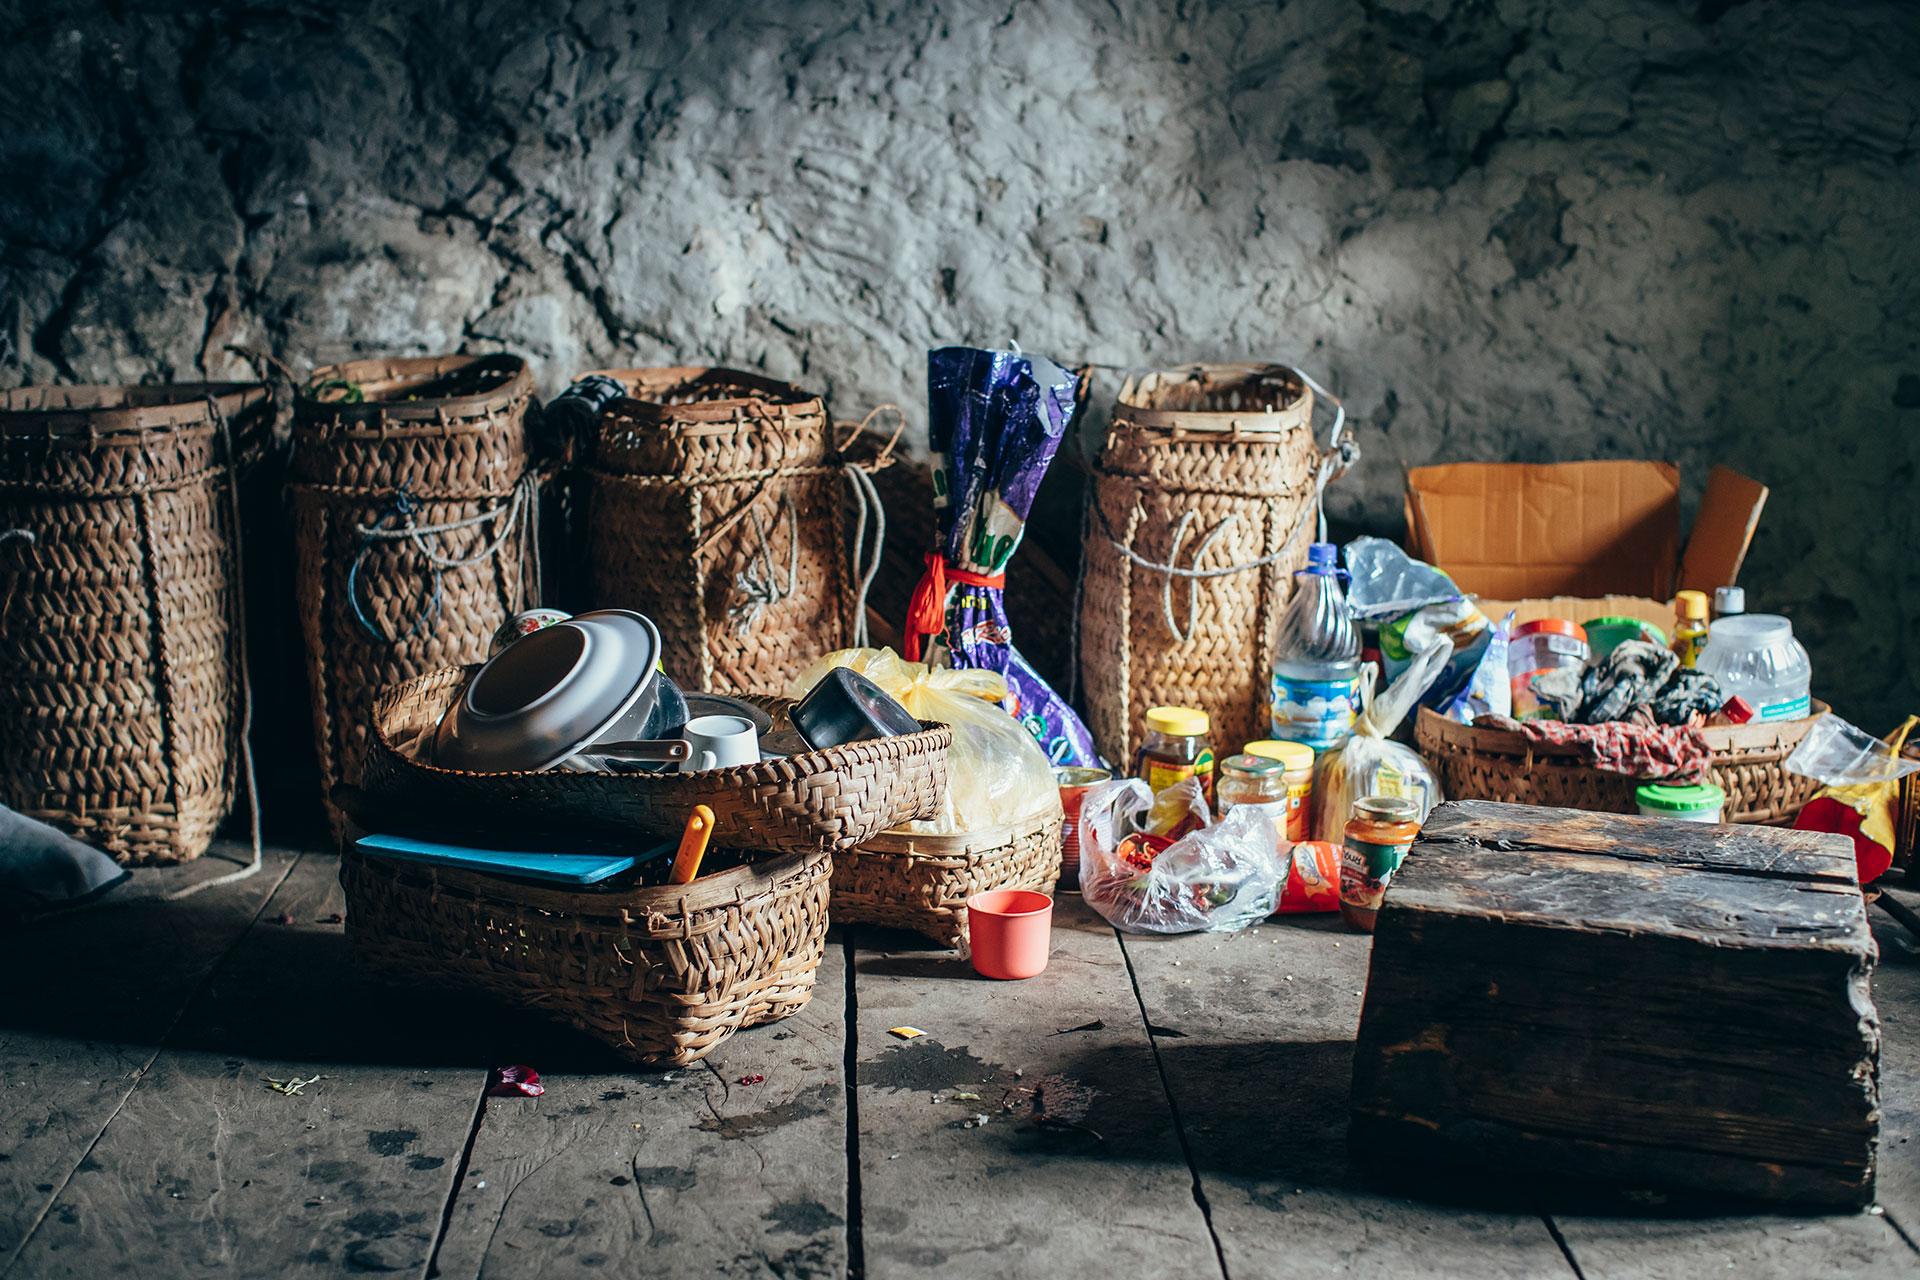 Fotograf Reise Trekking People Bhutan Food Himalaya Outdoor